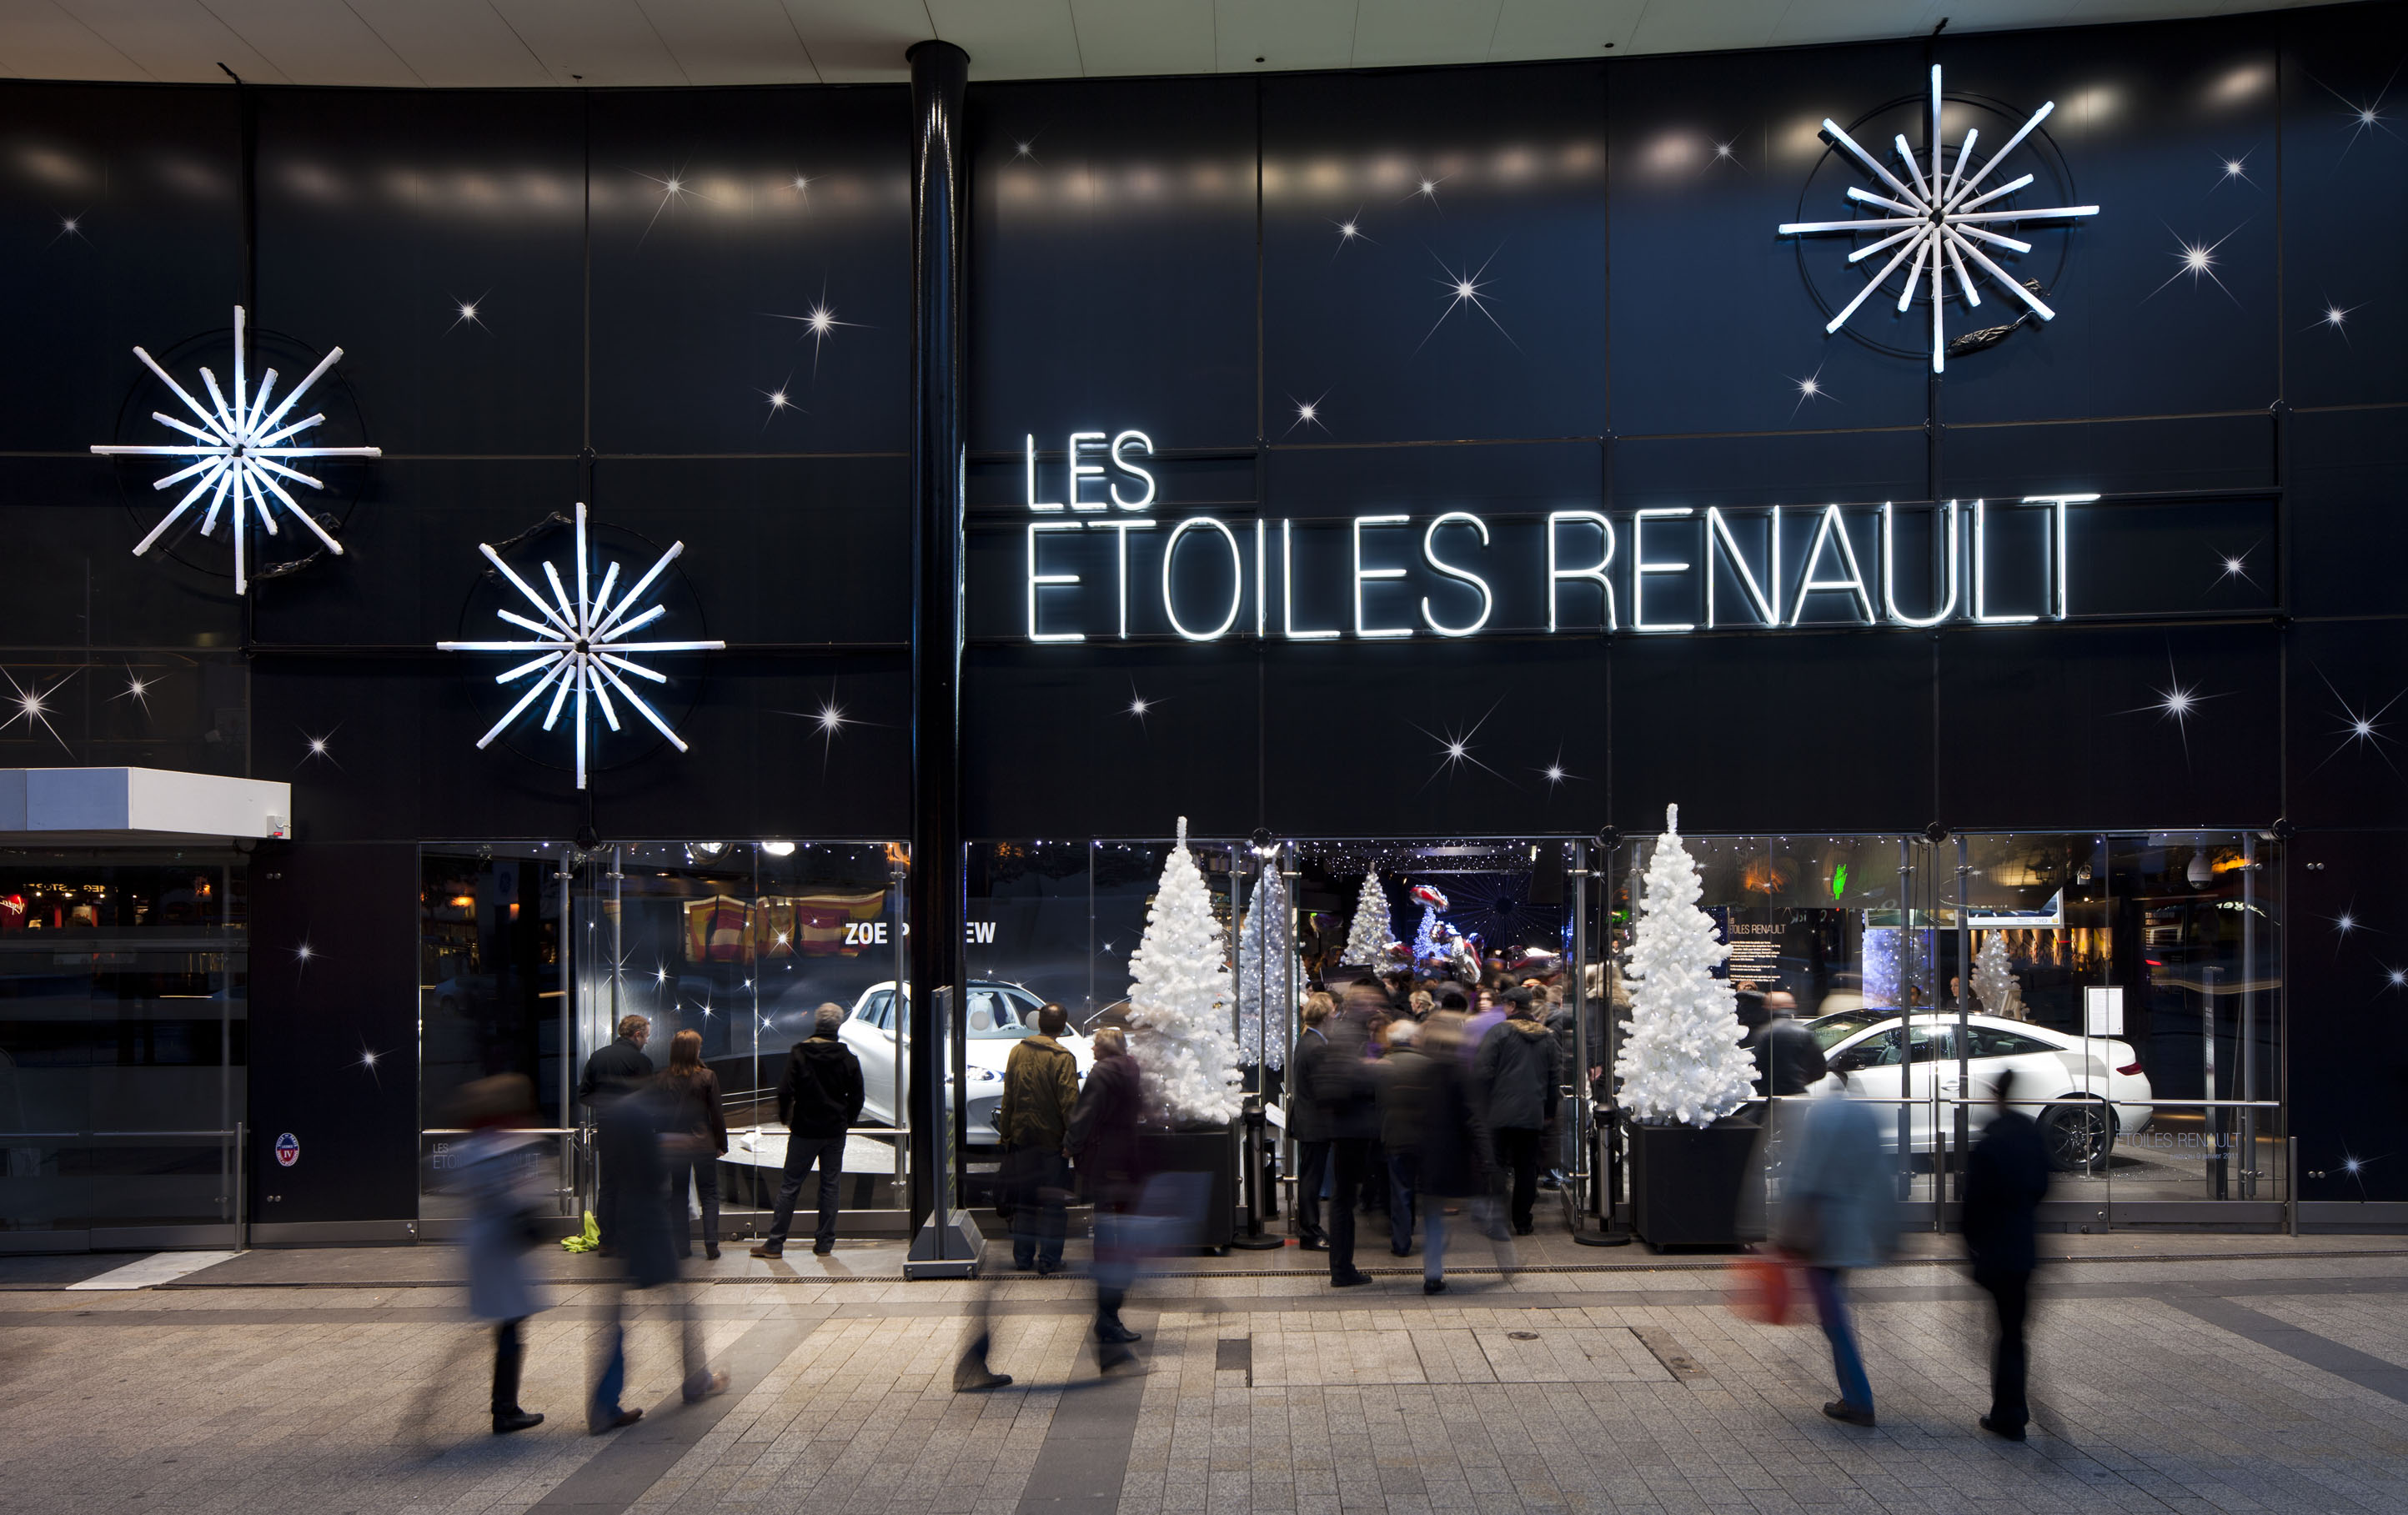 Atleier Renault - Les Etoiles